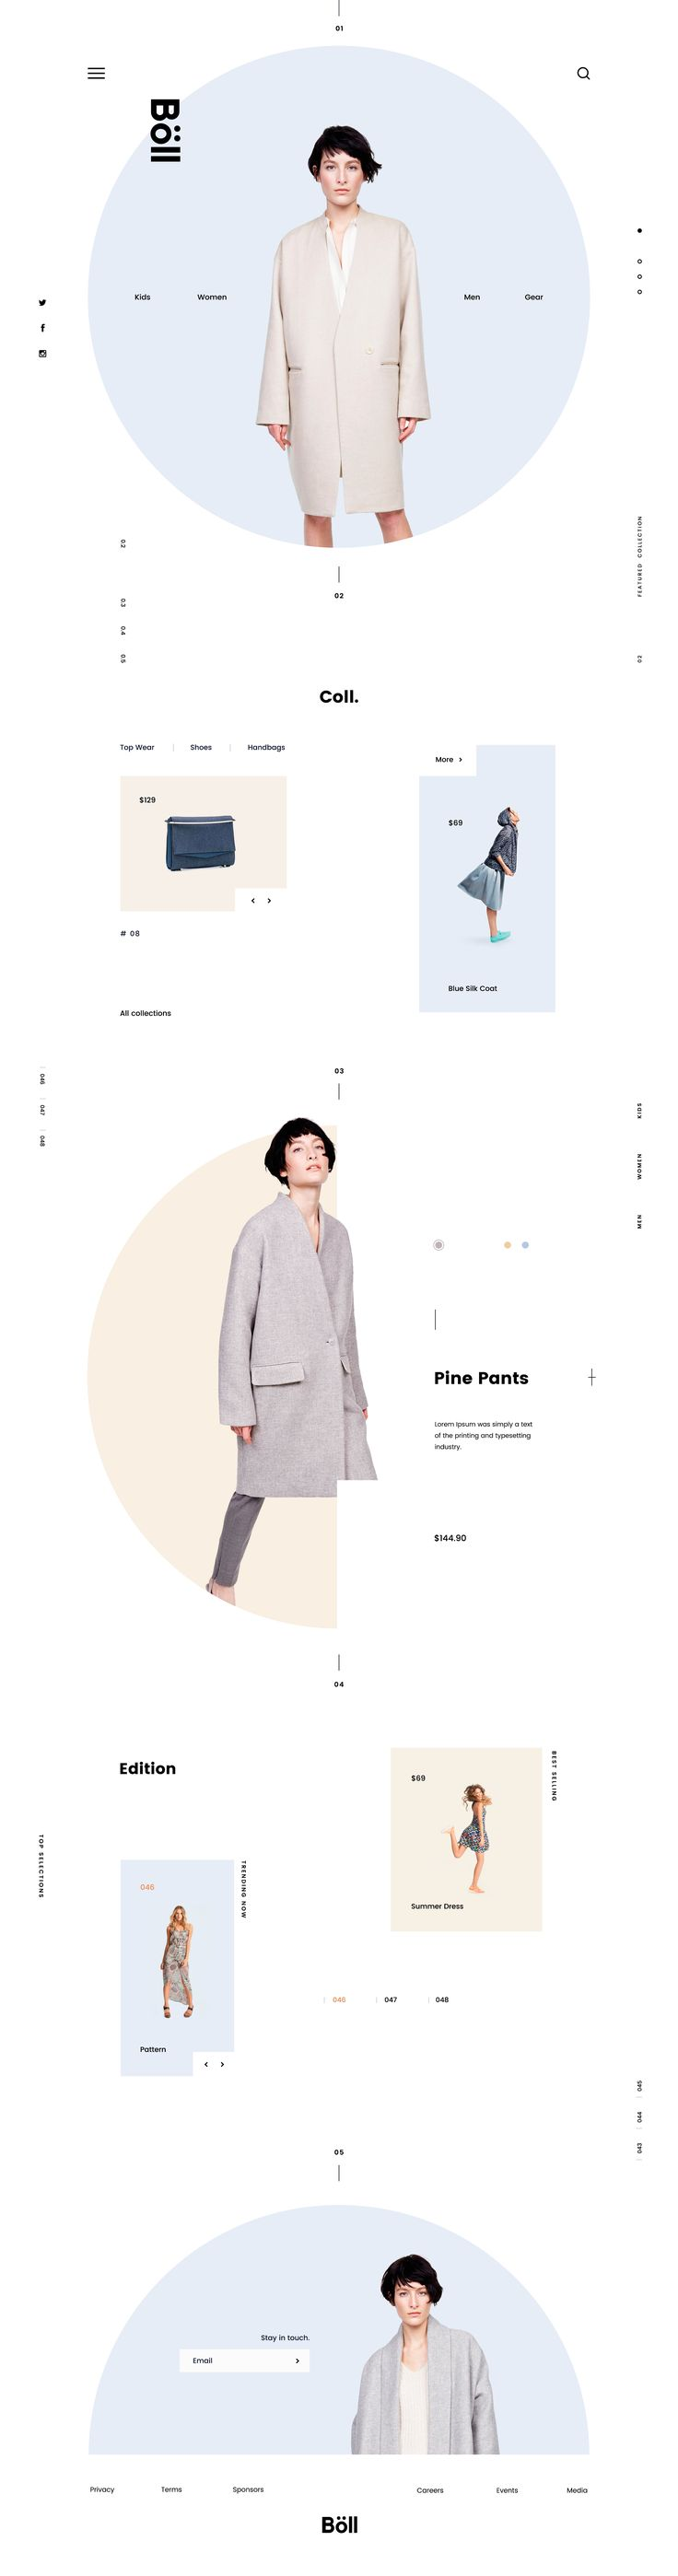 Website design for fashion e-commerce. Design style inspired from Scandinavian & Japanese fusion http://ecommerce.jrstudioweb.com/